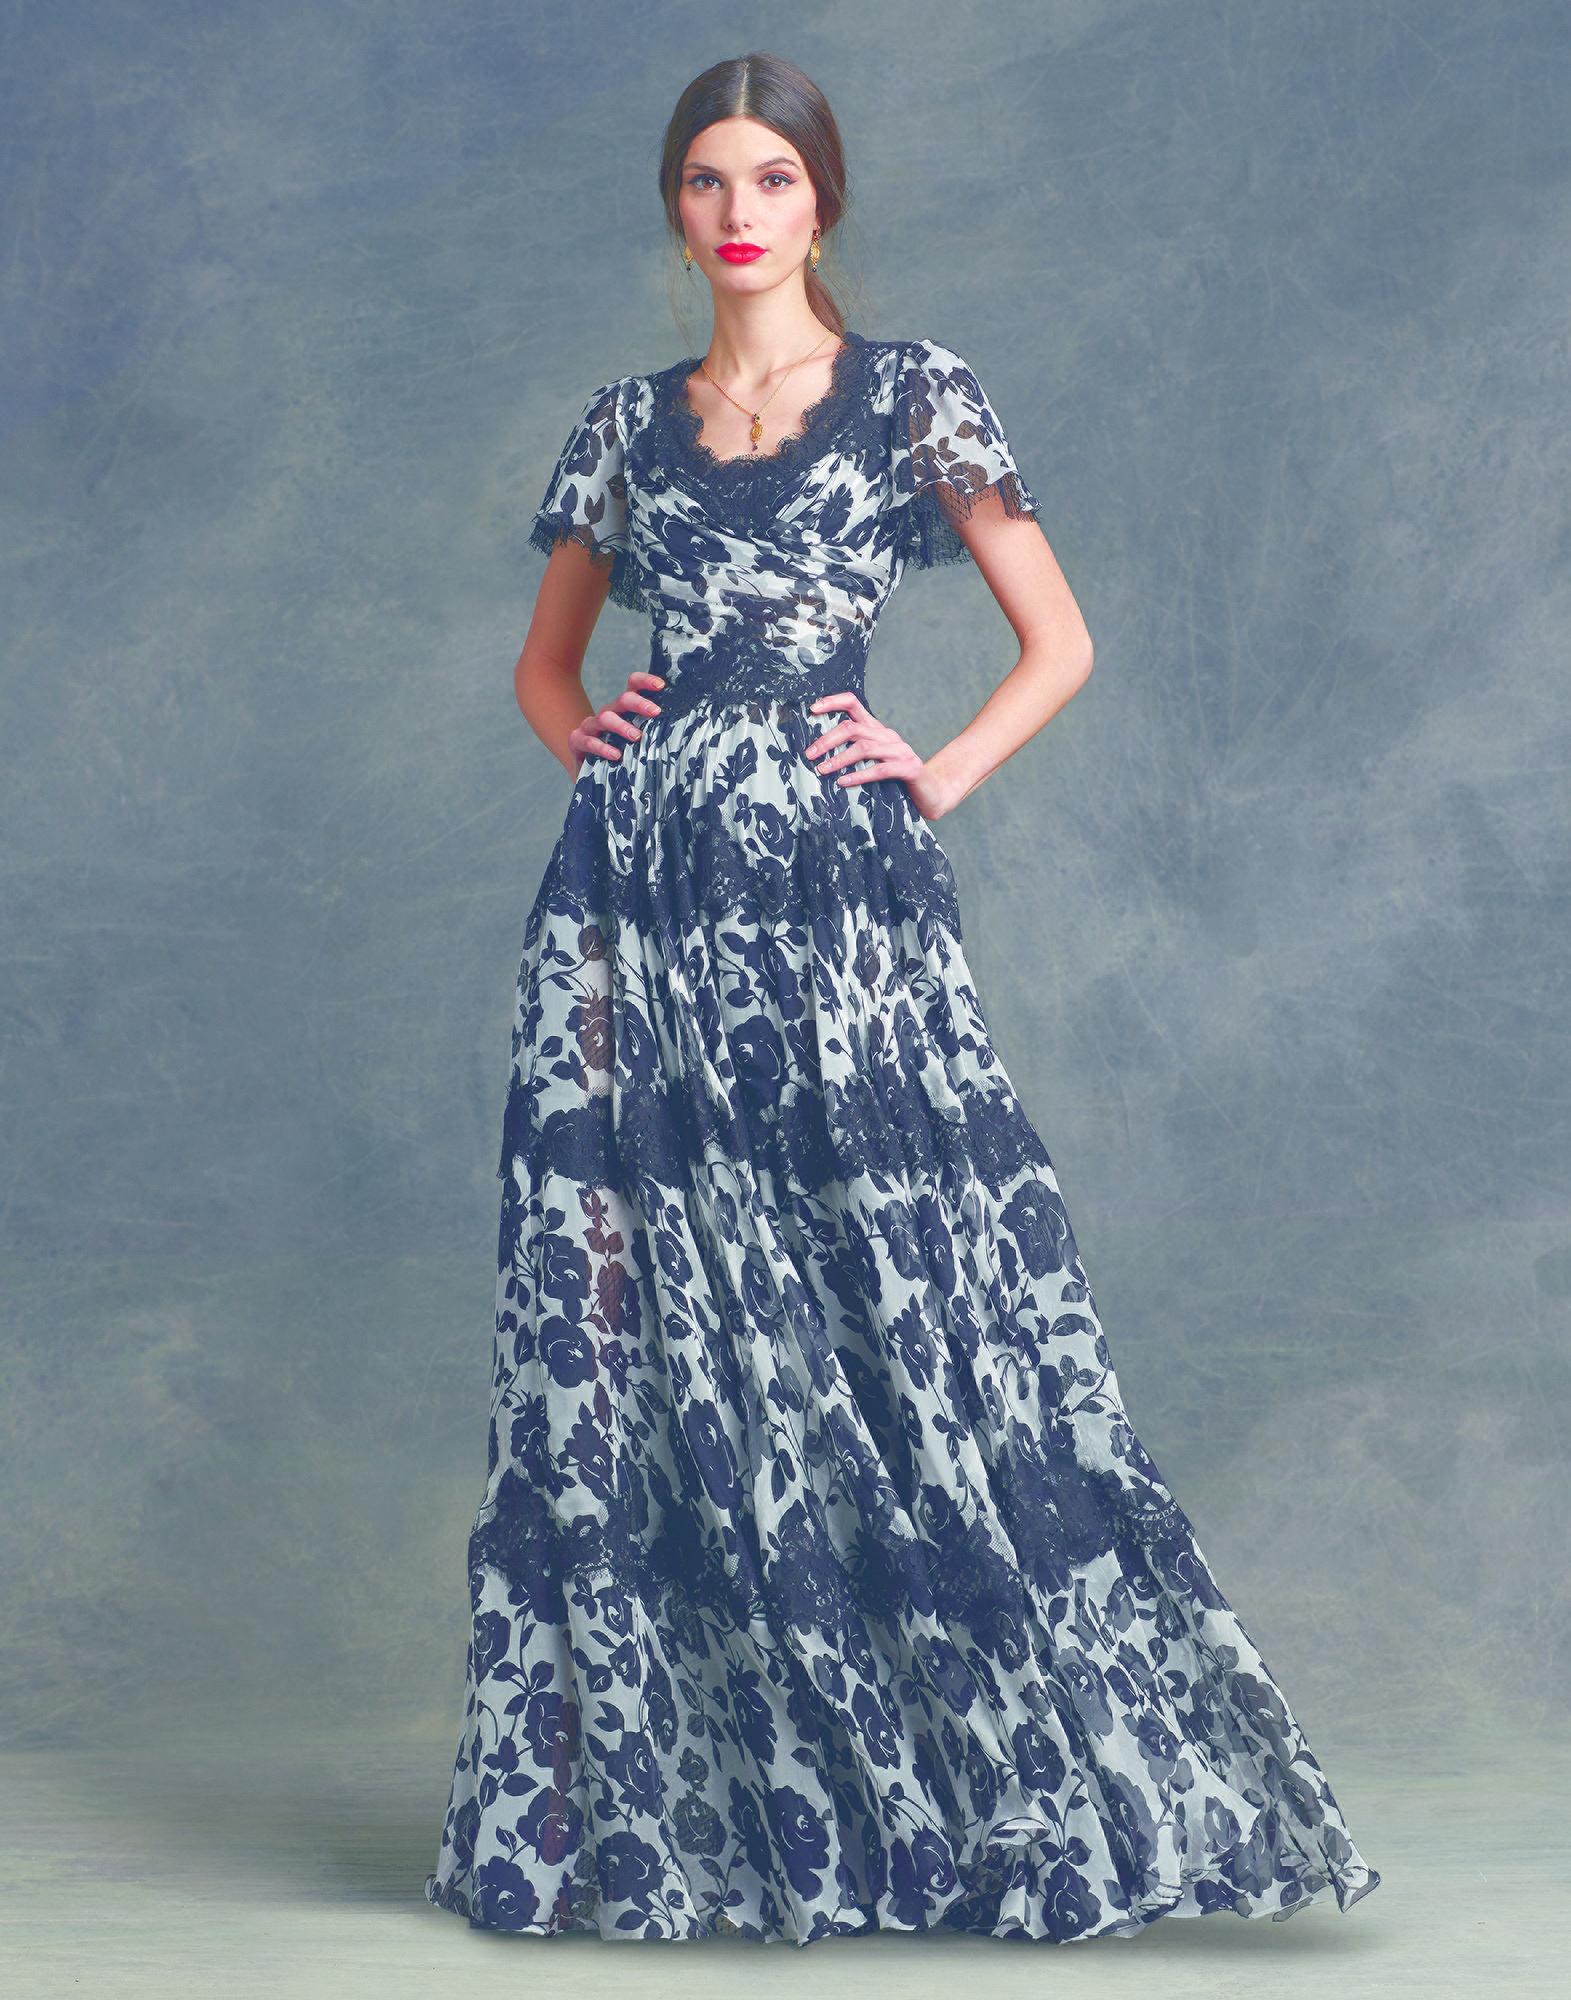 Chiffon Lace With Gabbana In Long Dolce Printed Lyst Dress amp; xgZaqz6n0w